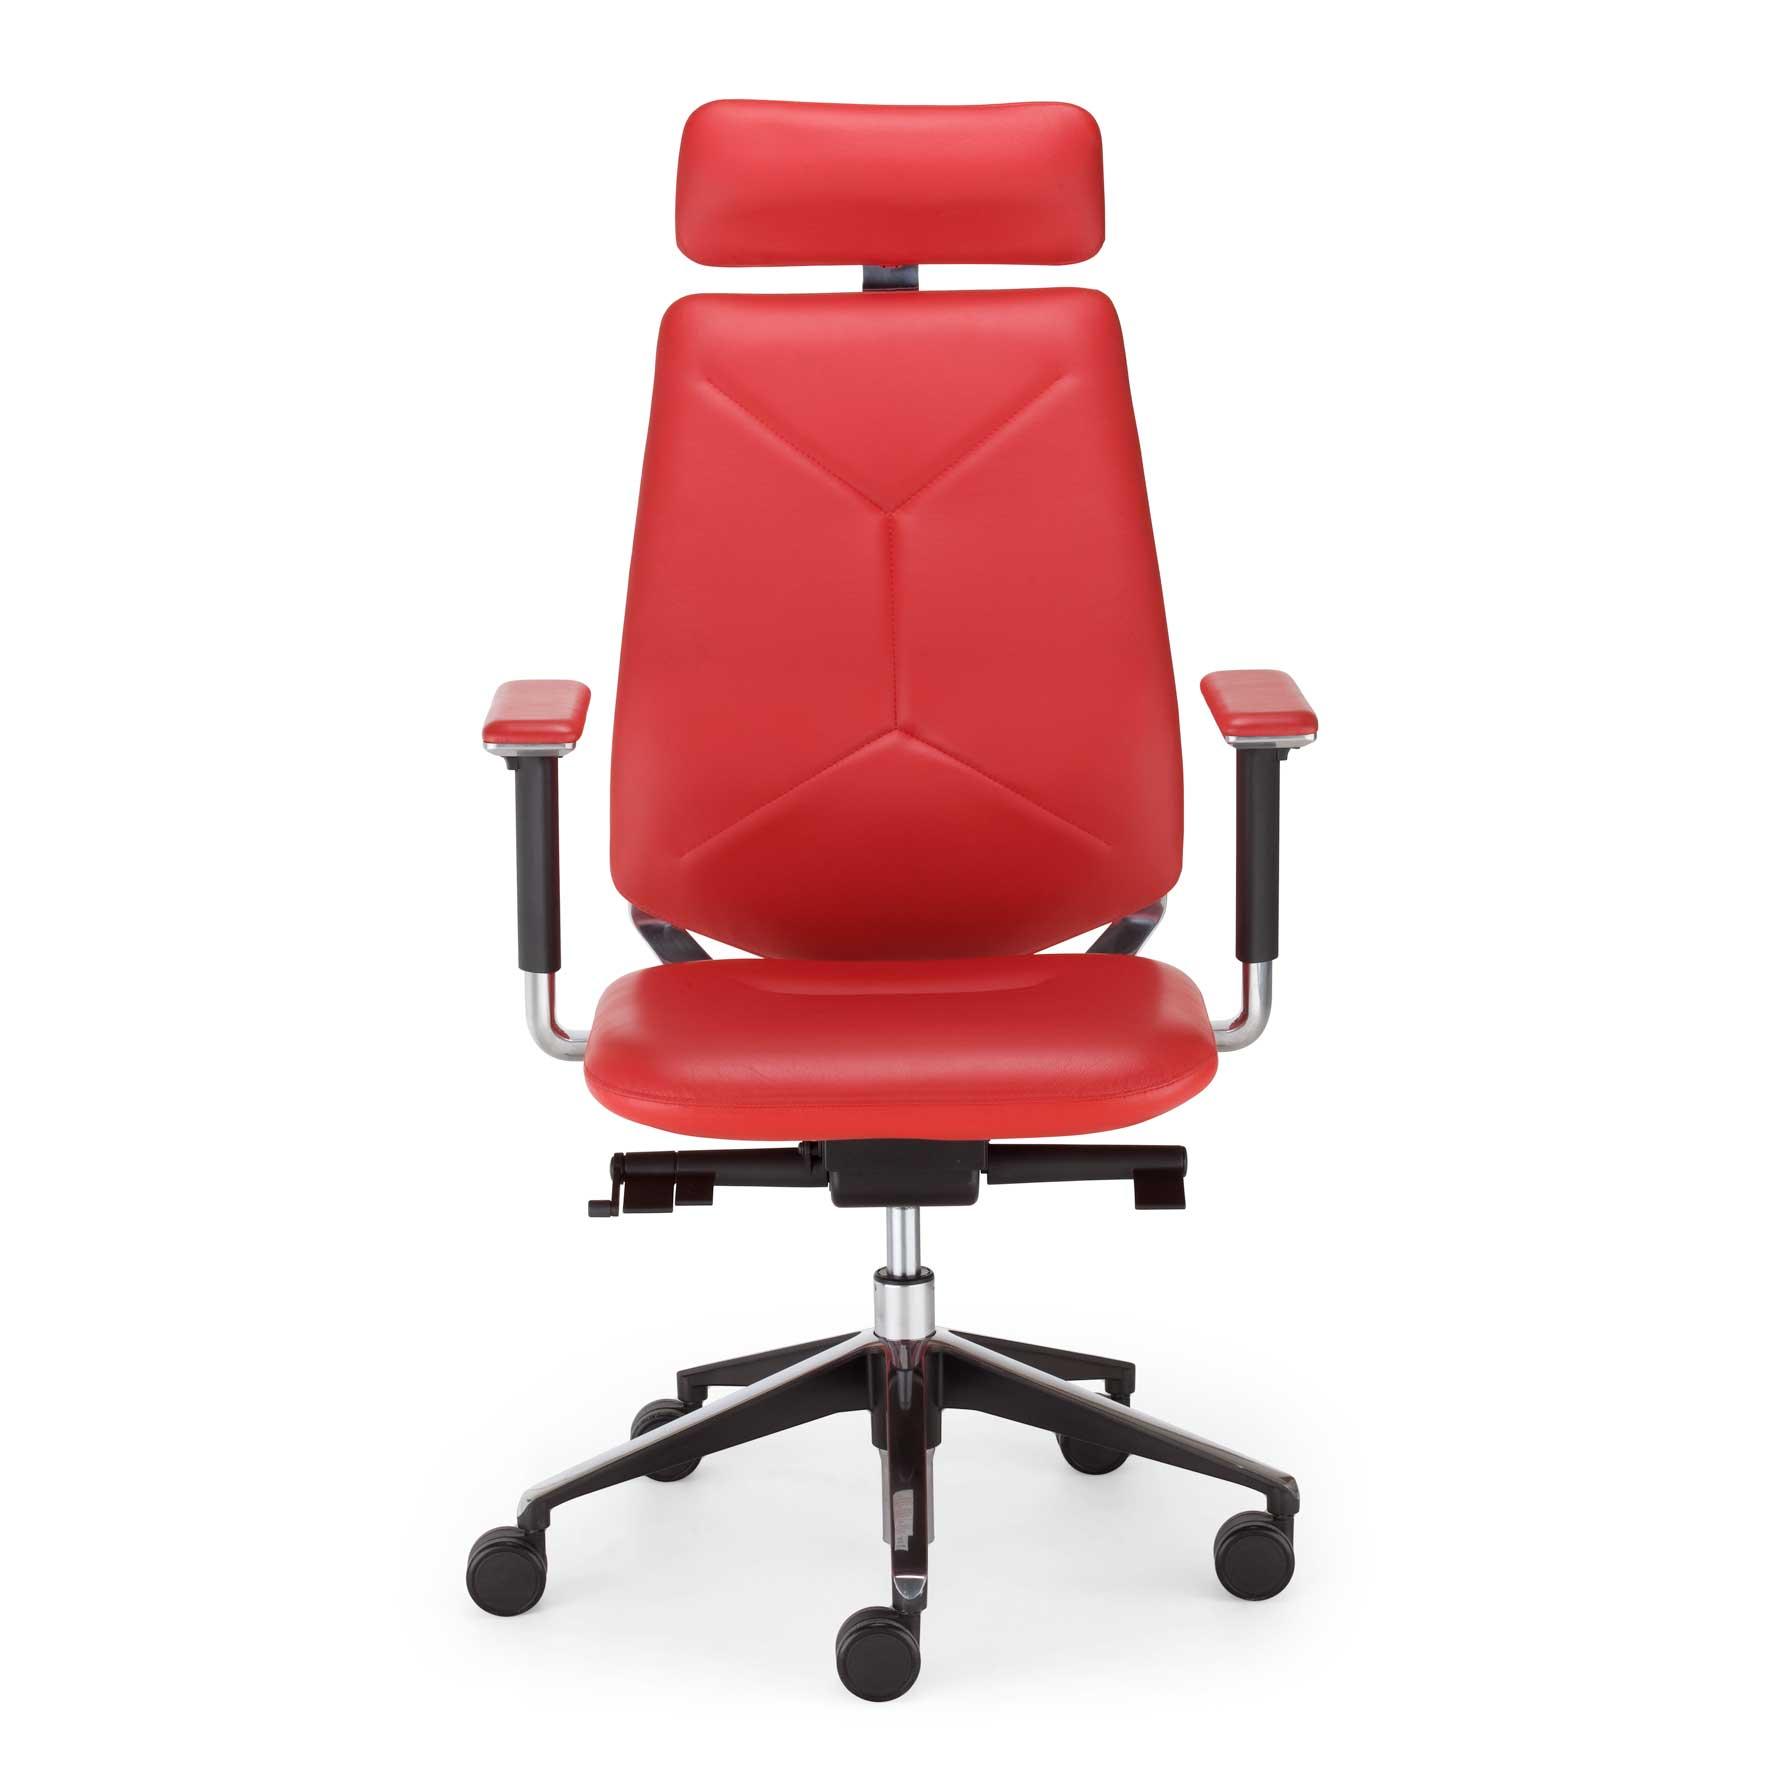 http://sedni.bg/clients/168/images/catalog/products/00ec0e51bde715aa_Next_U_HR_R23P1_steel29_chrome_EpronSyncron_Plus_seat_slidingLE05_przod.jpg